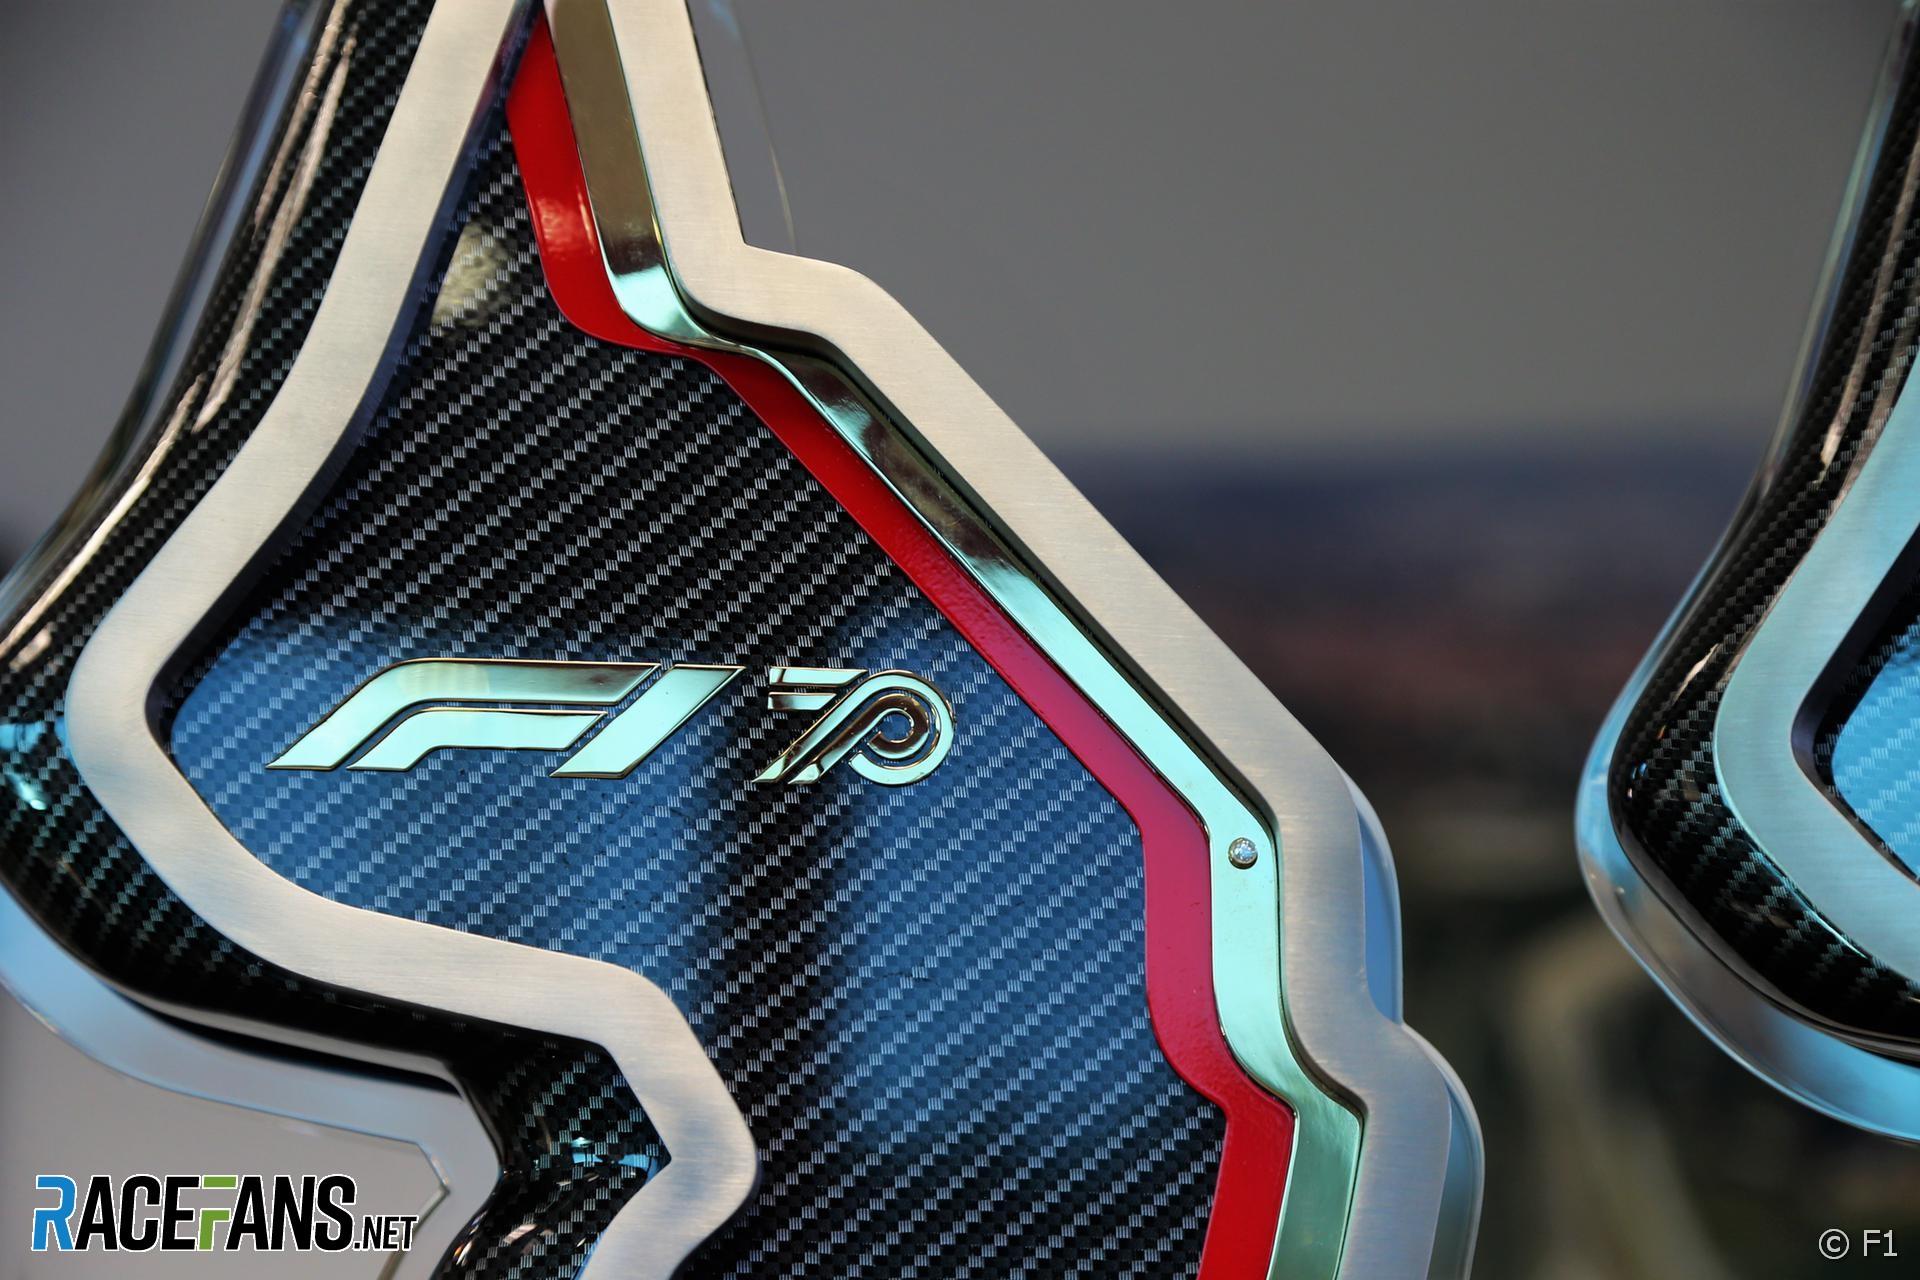 2020 Emilia-Romagna Grand Prix trophy